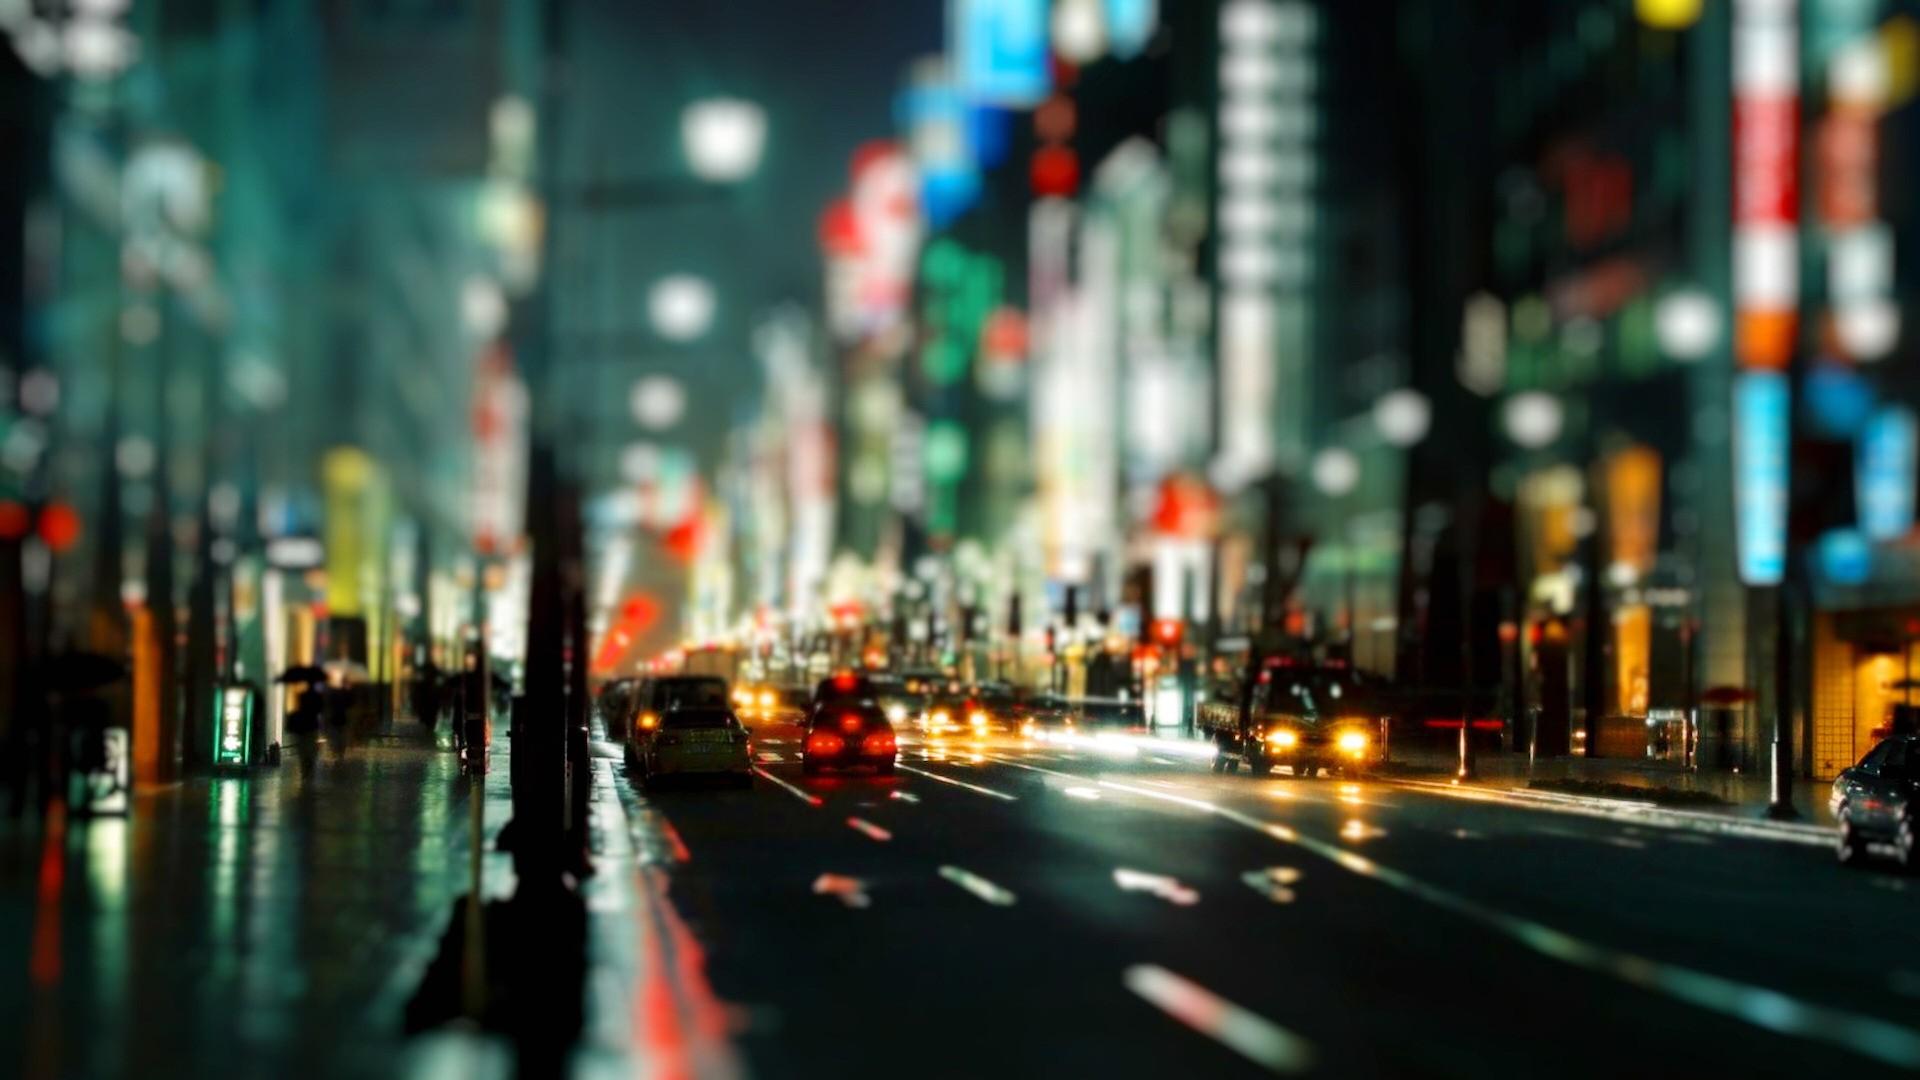 City Lights Wallpaper